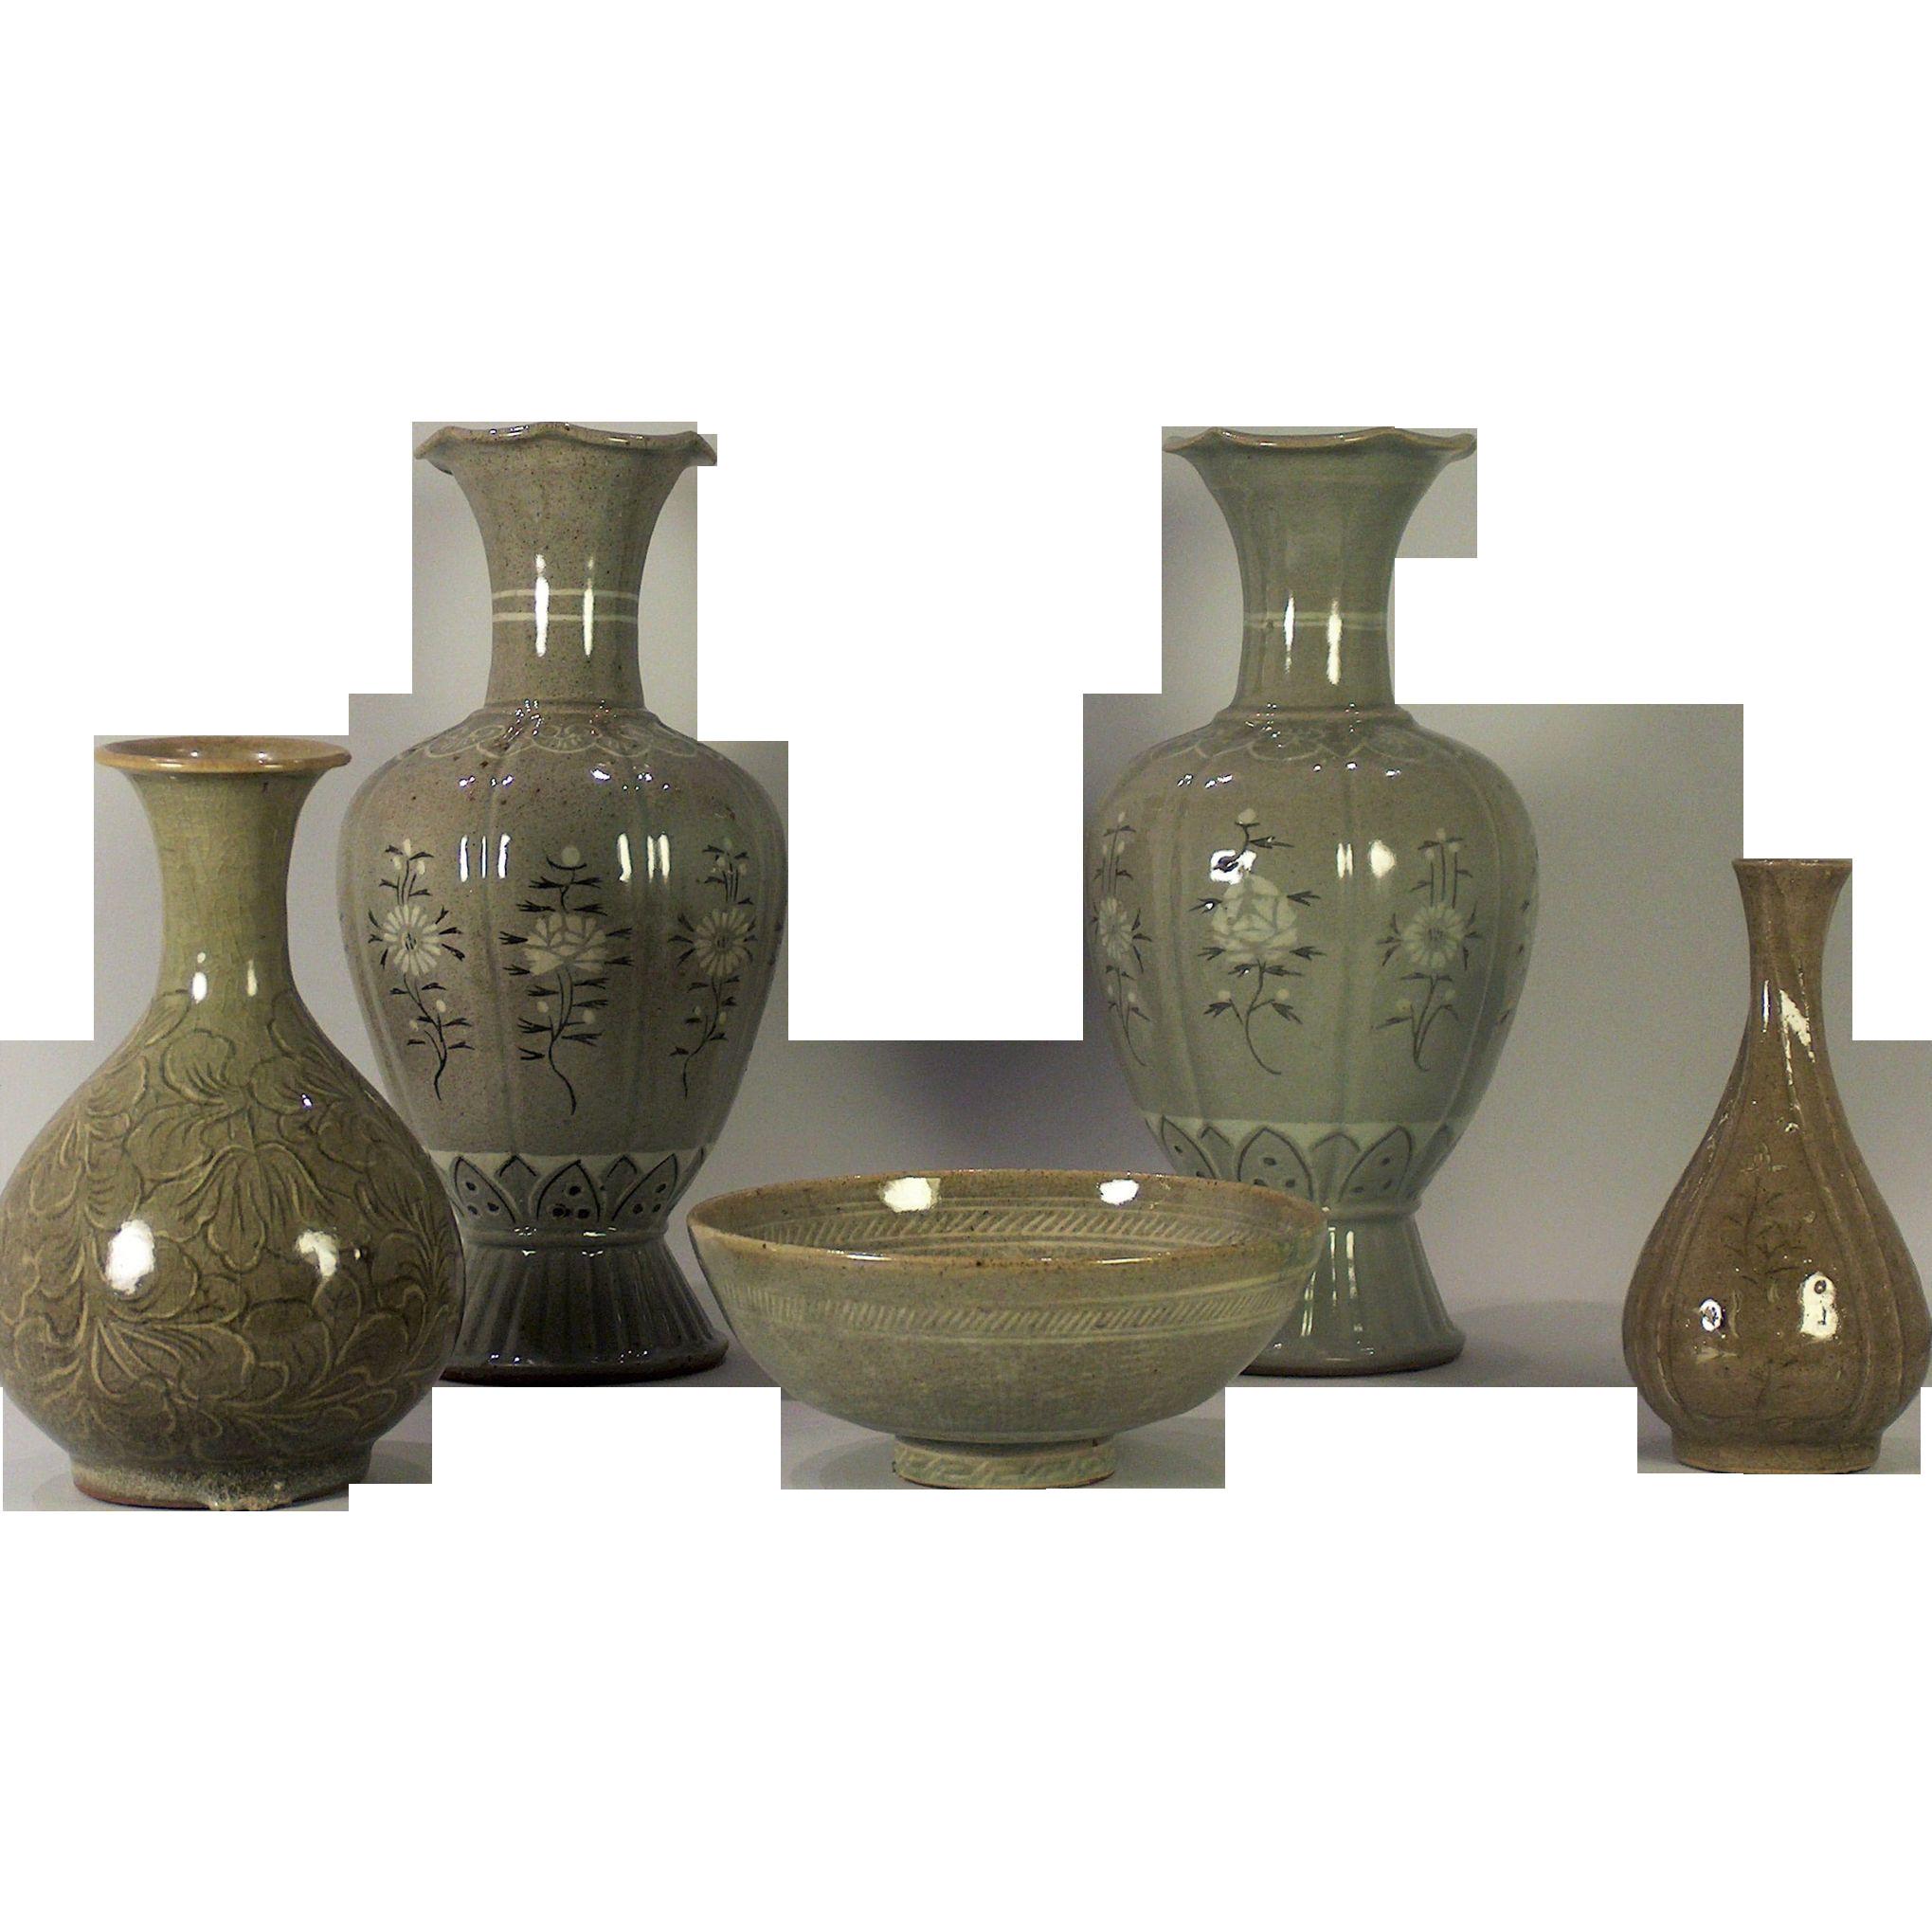 goryeo celadon vase of important korean chosen dynasty celadon gourd shape vase 12hx5 4 in important korean chosen dynasty celadon gourd shape vase 12hx5 4dia decorated with crane scene e·¸e¦‡ iˆ˜i € pinterest